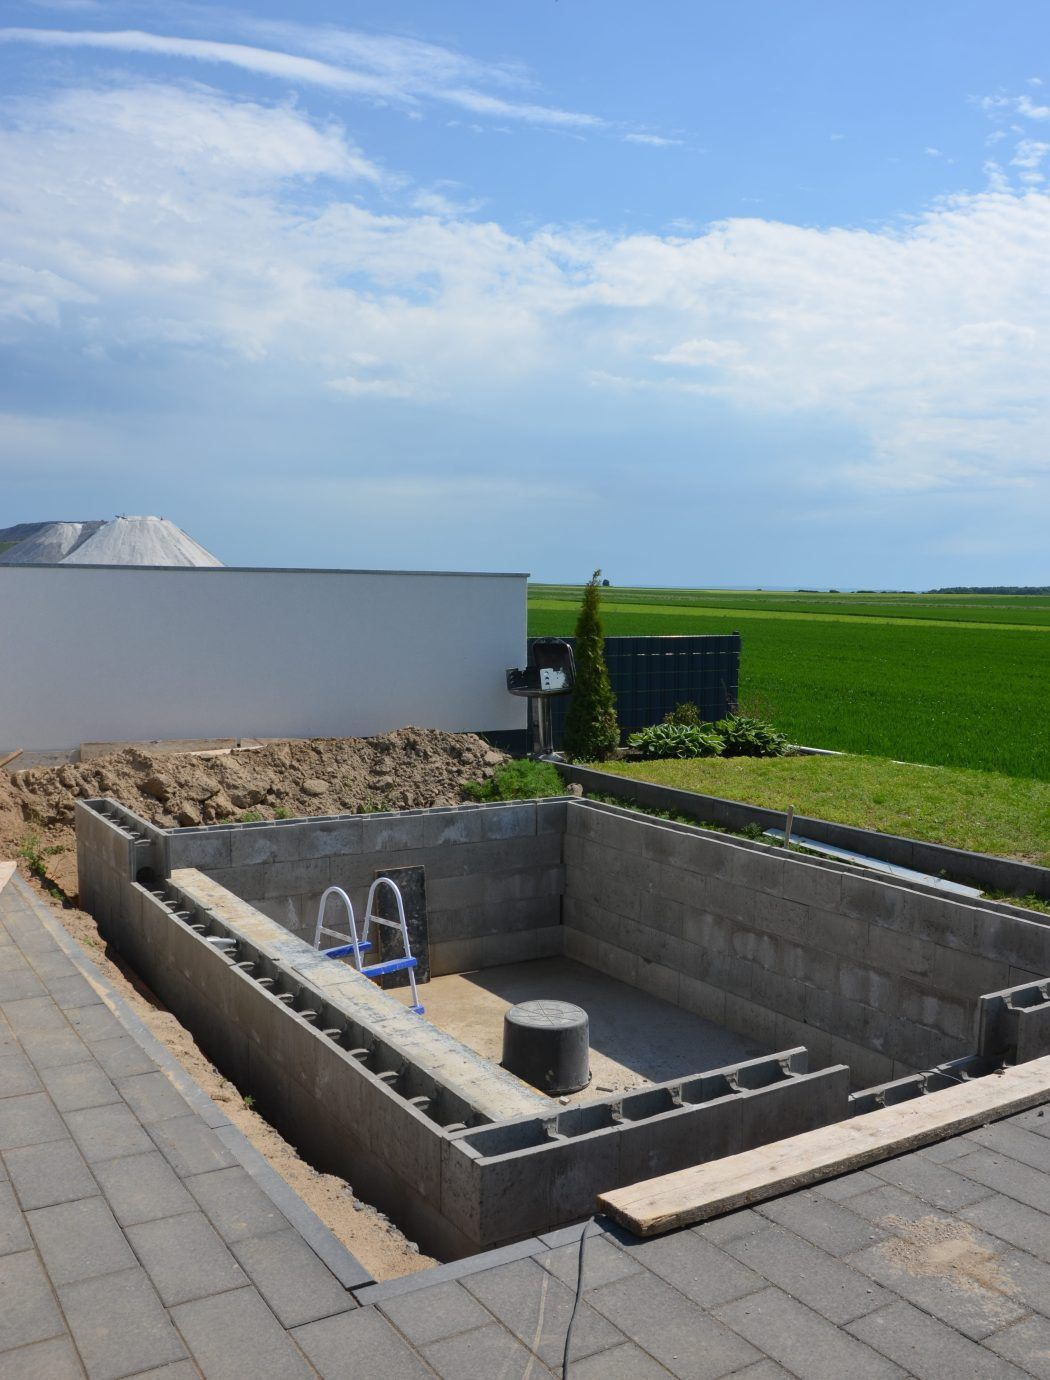 schwimmbecken pool garden pool swimming pools und swimming pool equipment. Black Bedroom Furniture Sets. Home Design Ideas